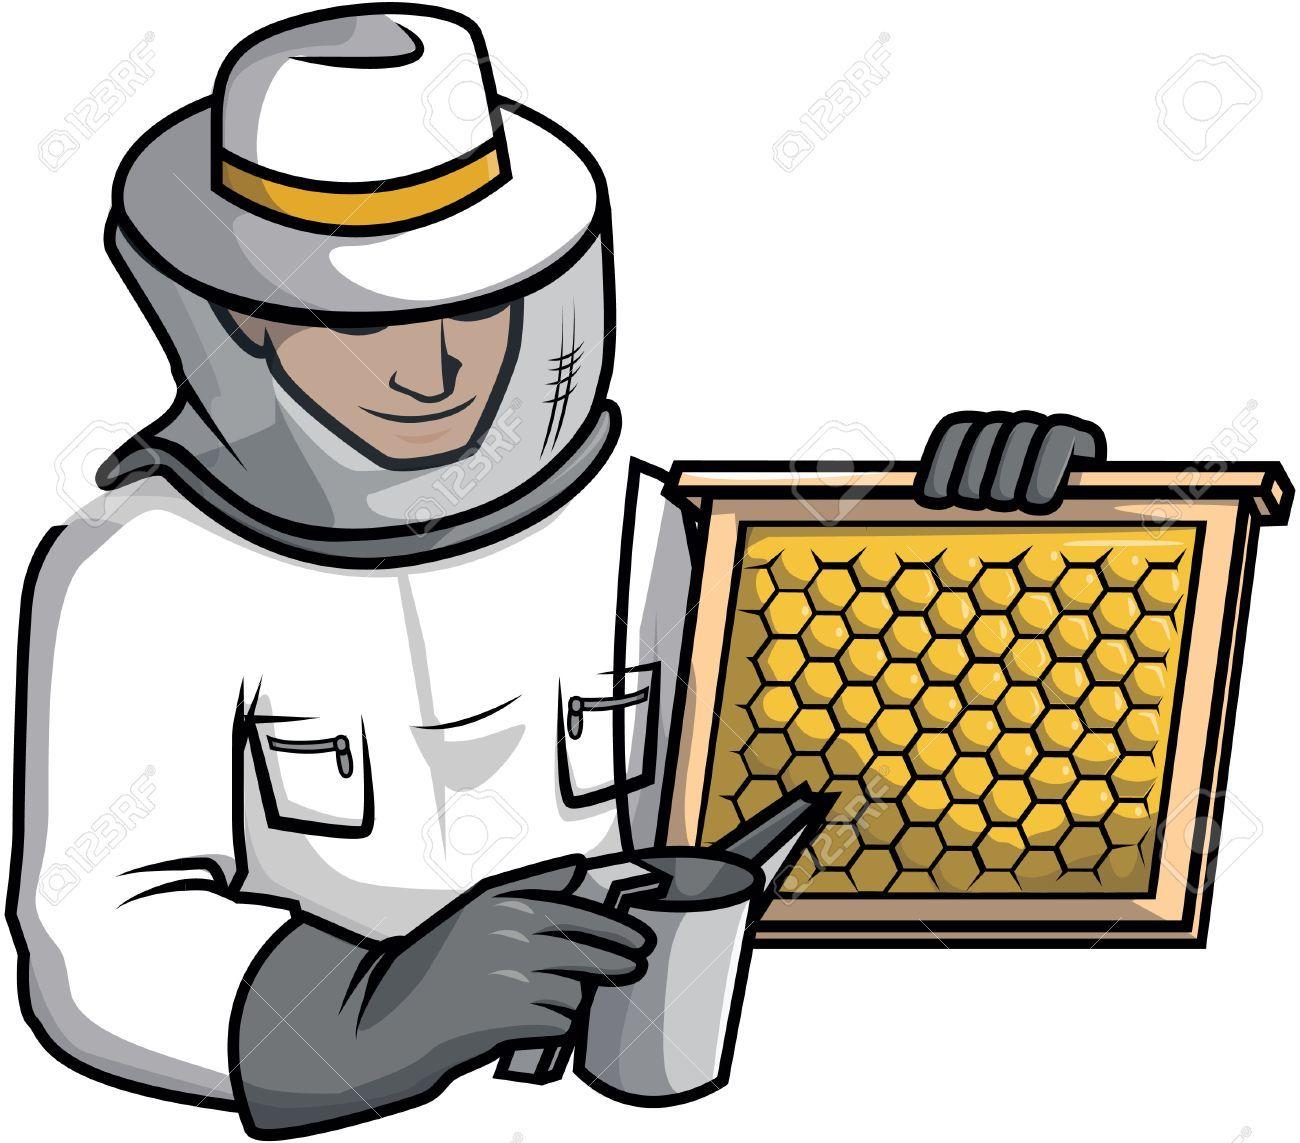 Bee keeper clipart 8 » Clipart Portal.